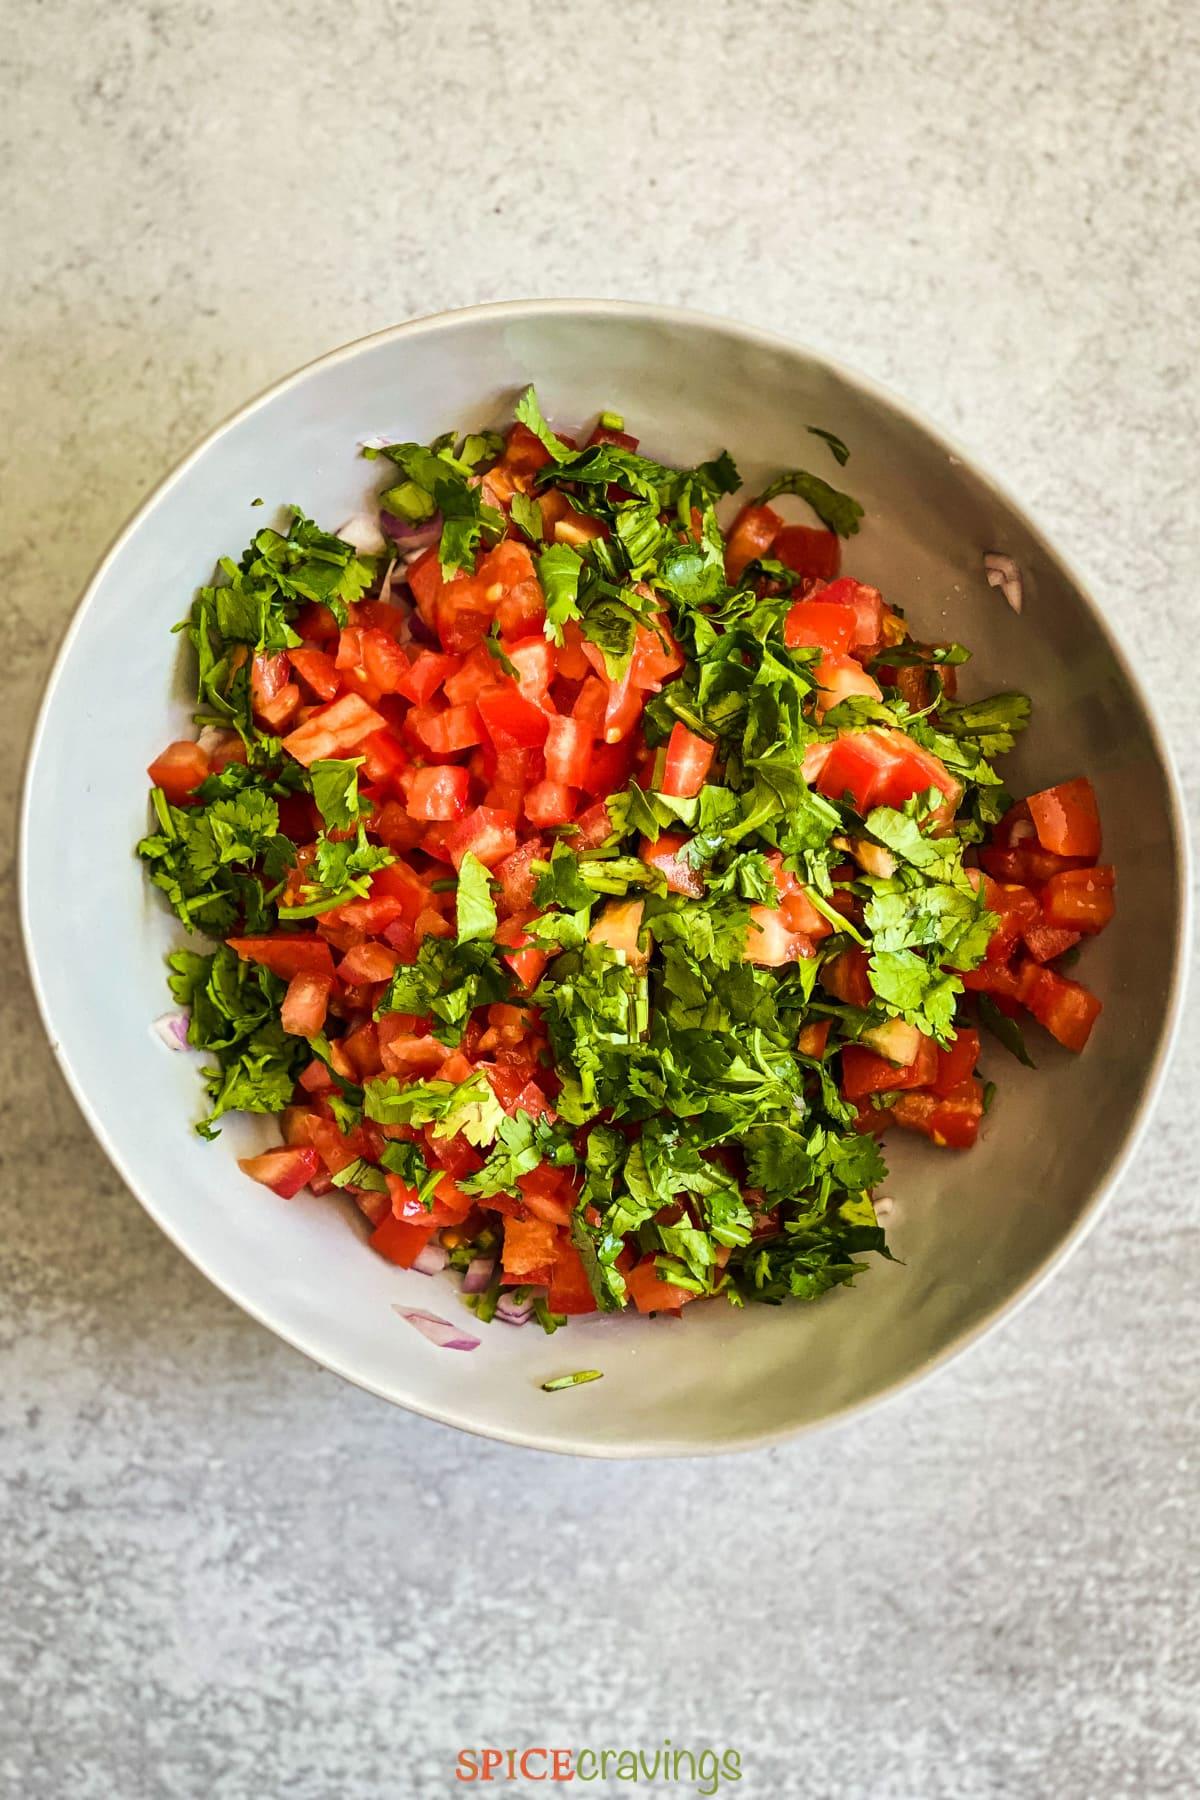 Bowl with chopped tomato, onion and cilantro